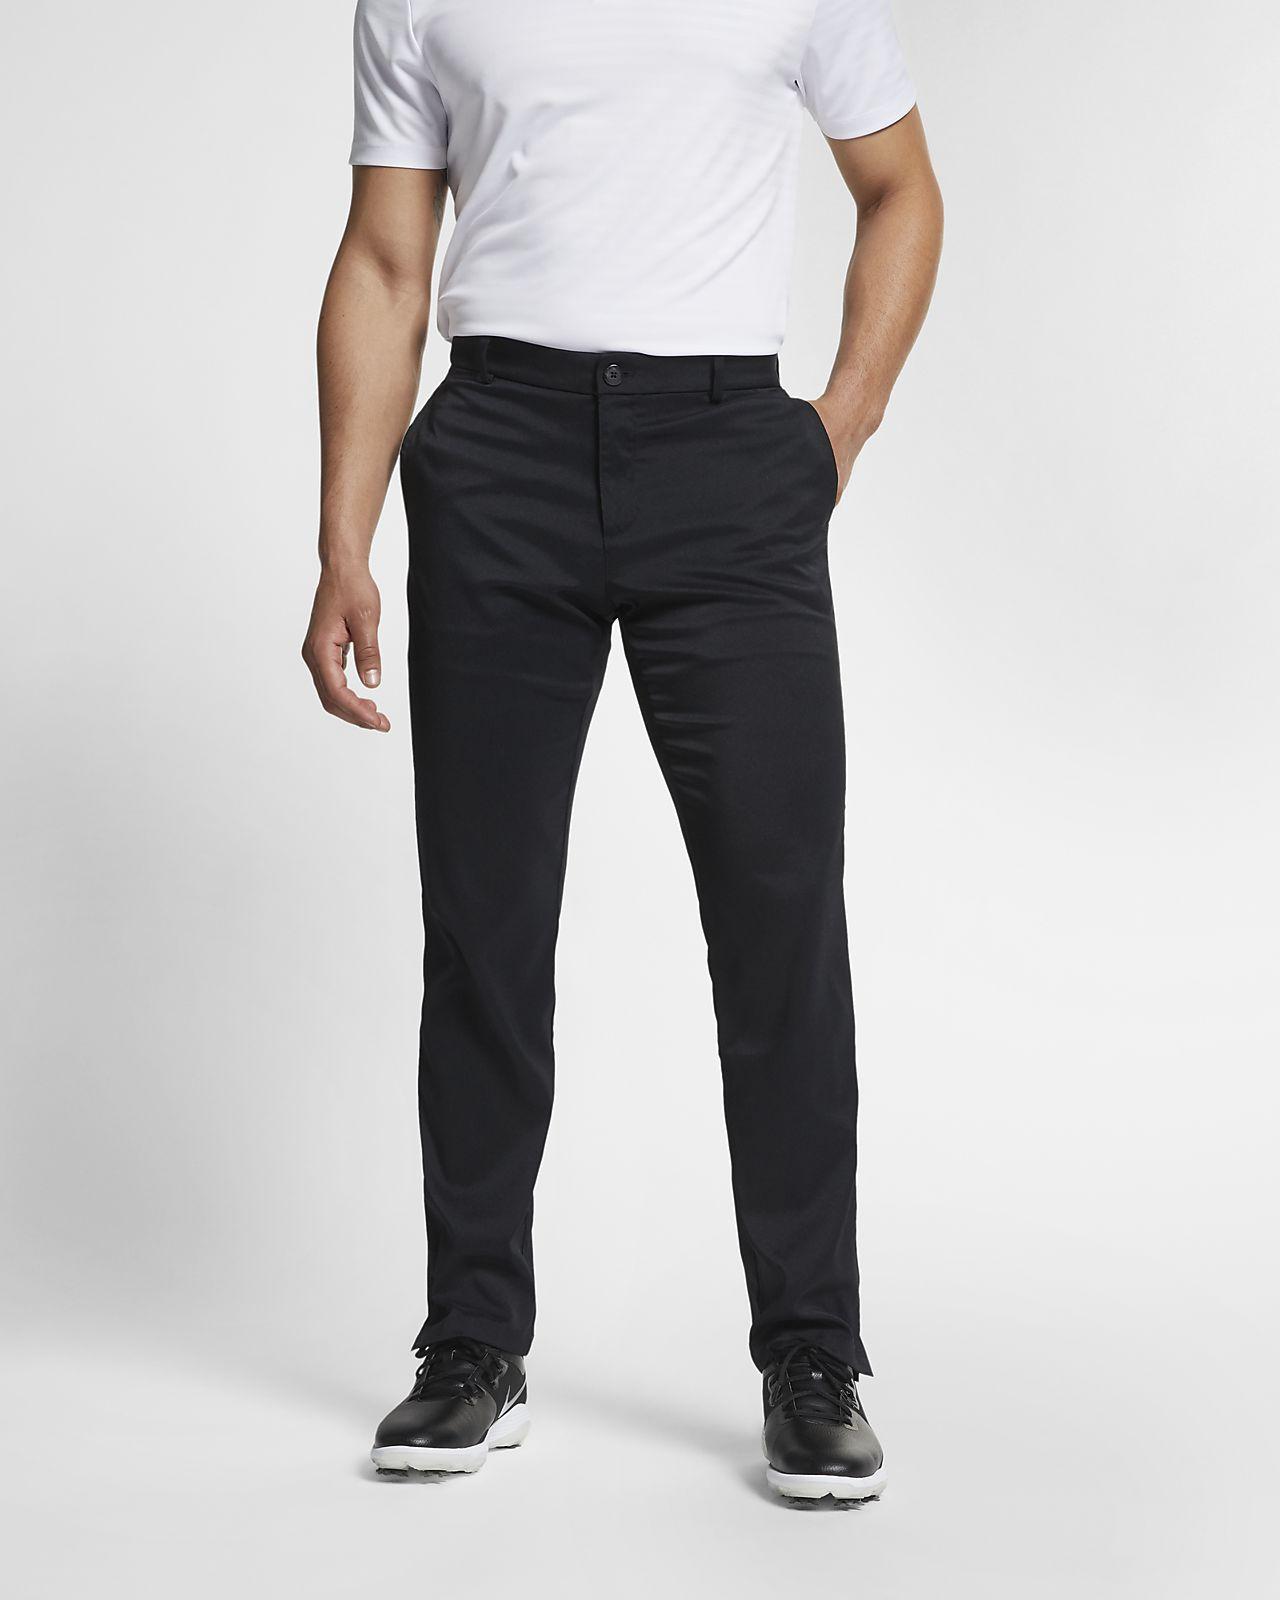 Pantalones de golf para hombre Nike Flex